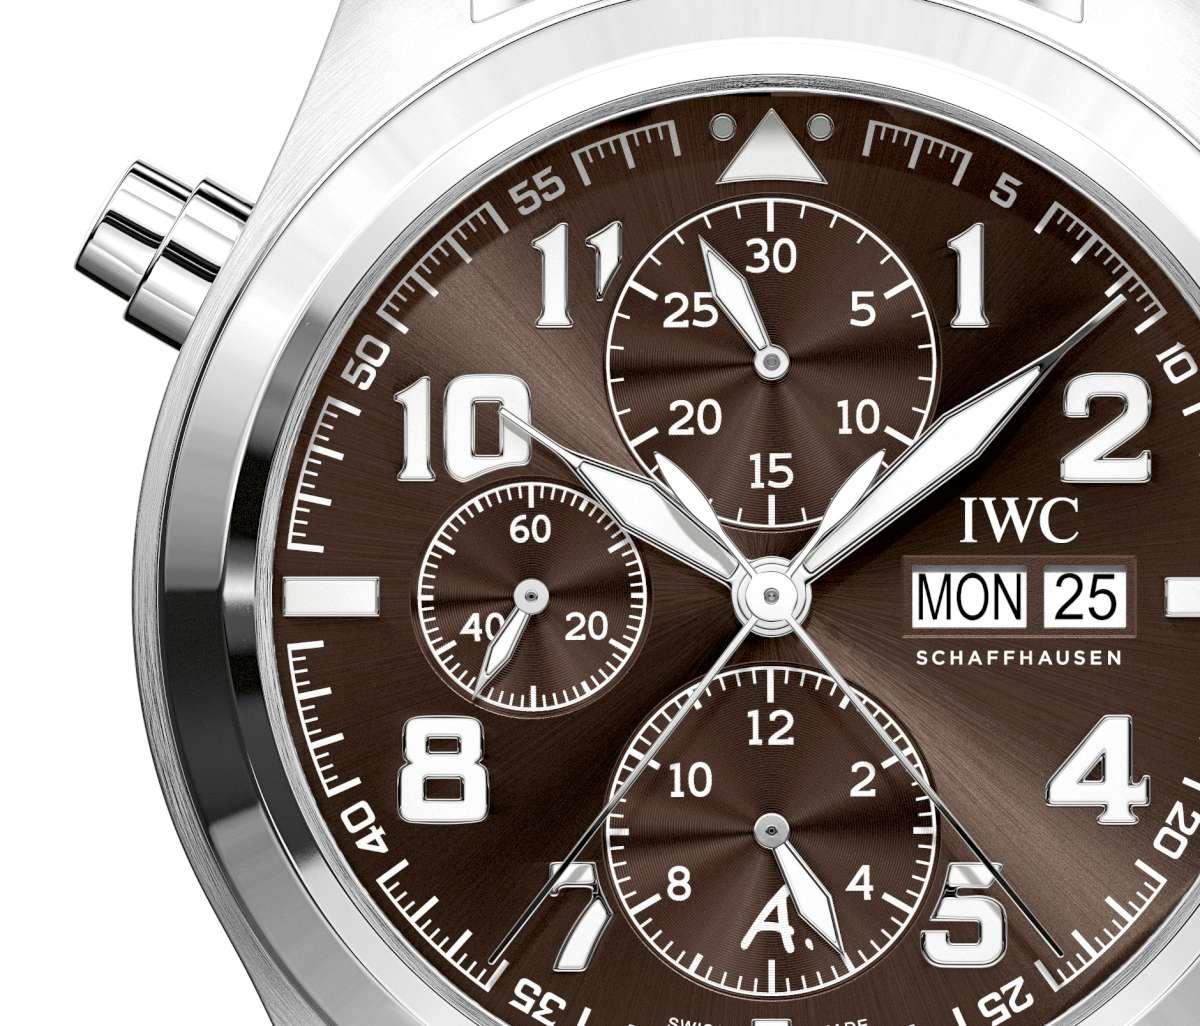 new product fca72 f4b2b IWC Pilot's Watch Double Chronograph Edition Antoine de ...